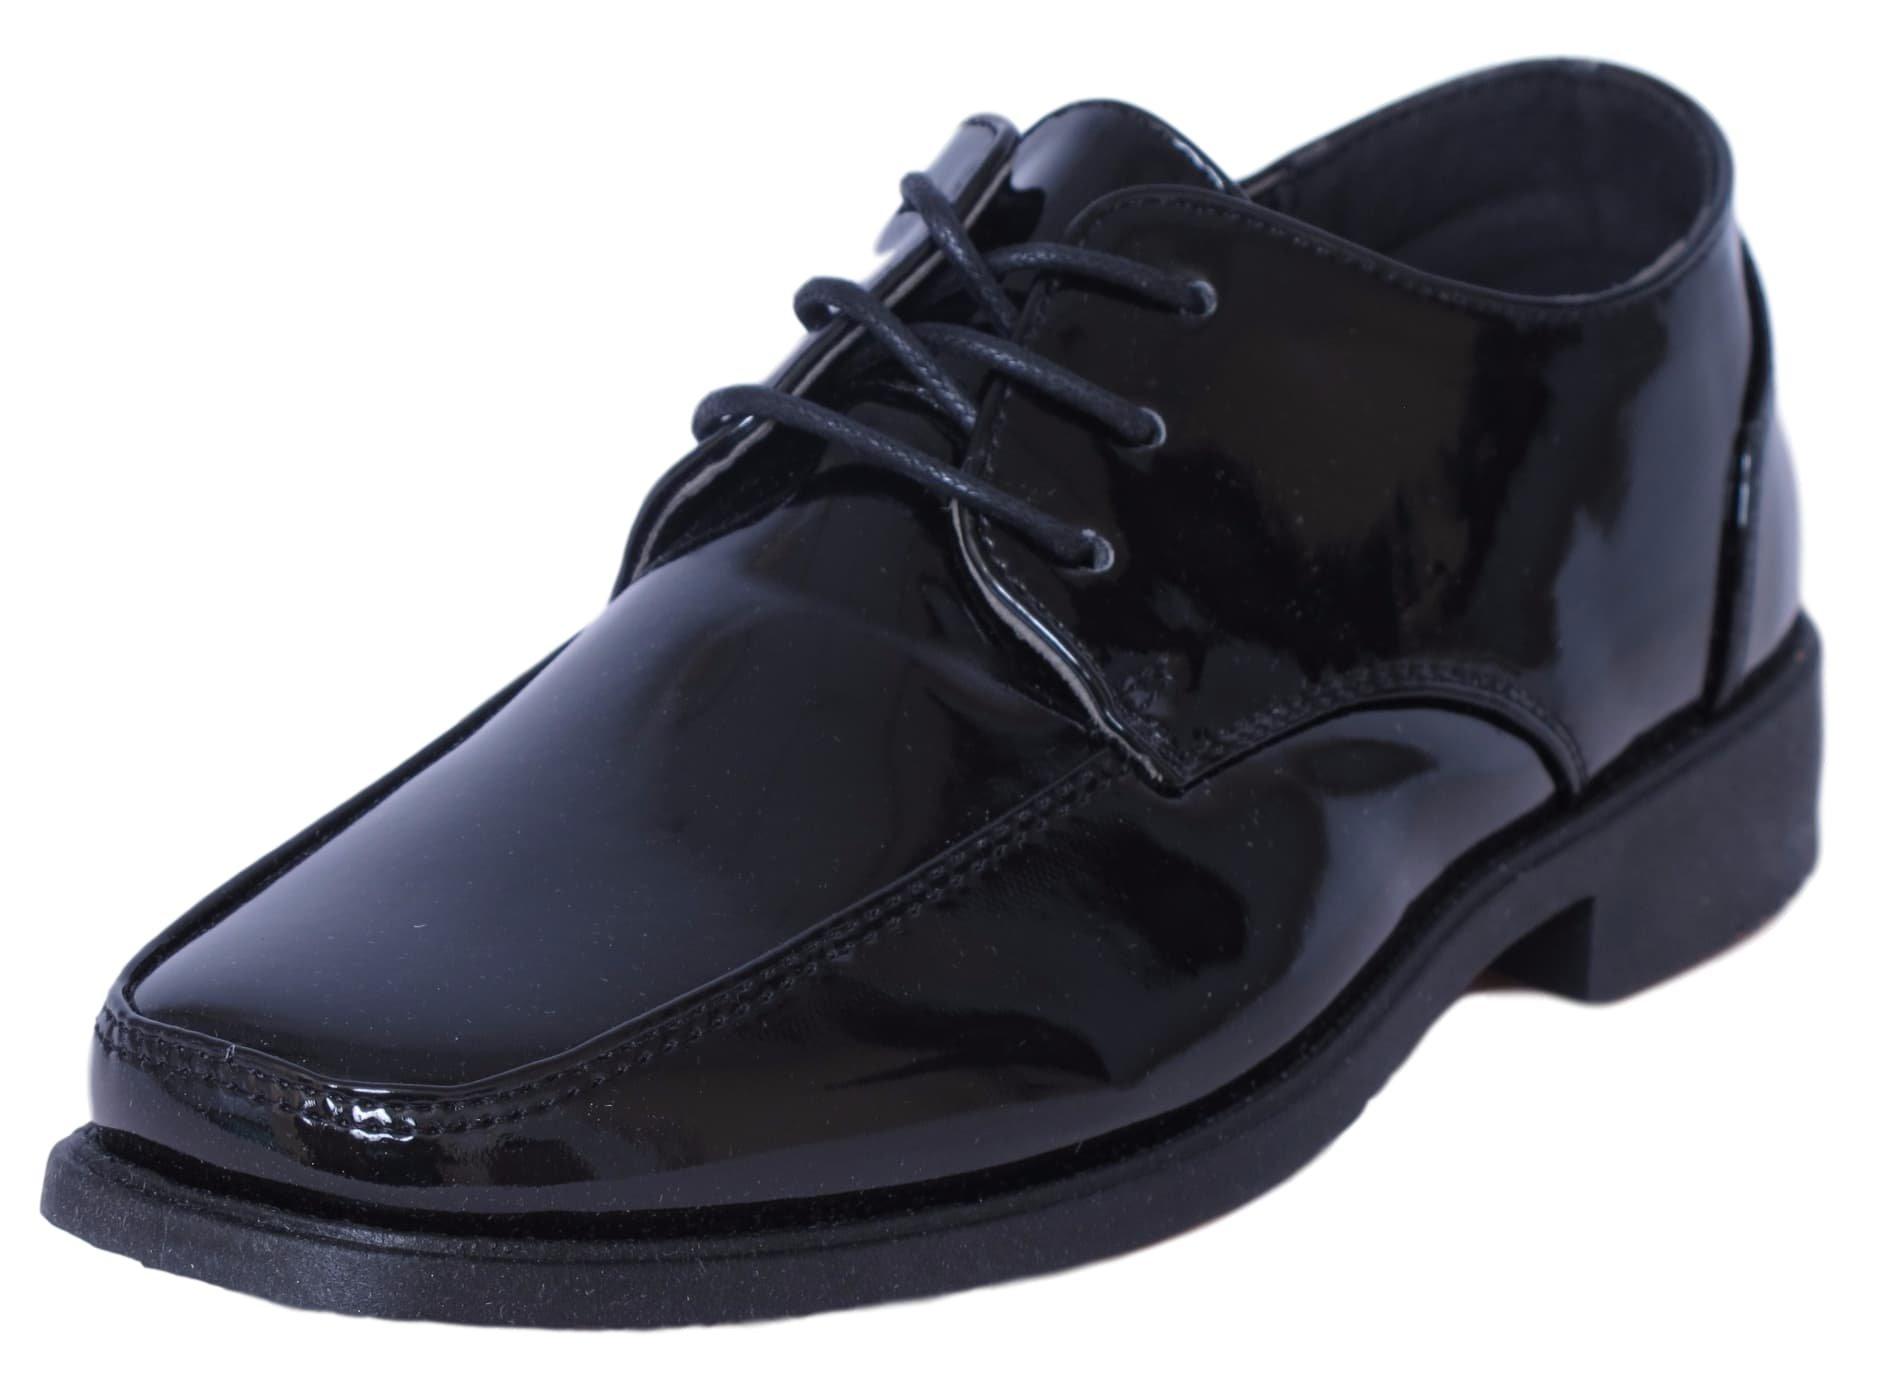 Josmo Boys Lace-Up Dress Shoes, Black Patent Size 8'